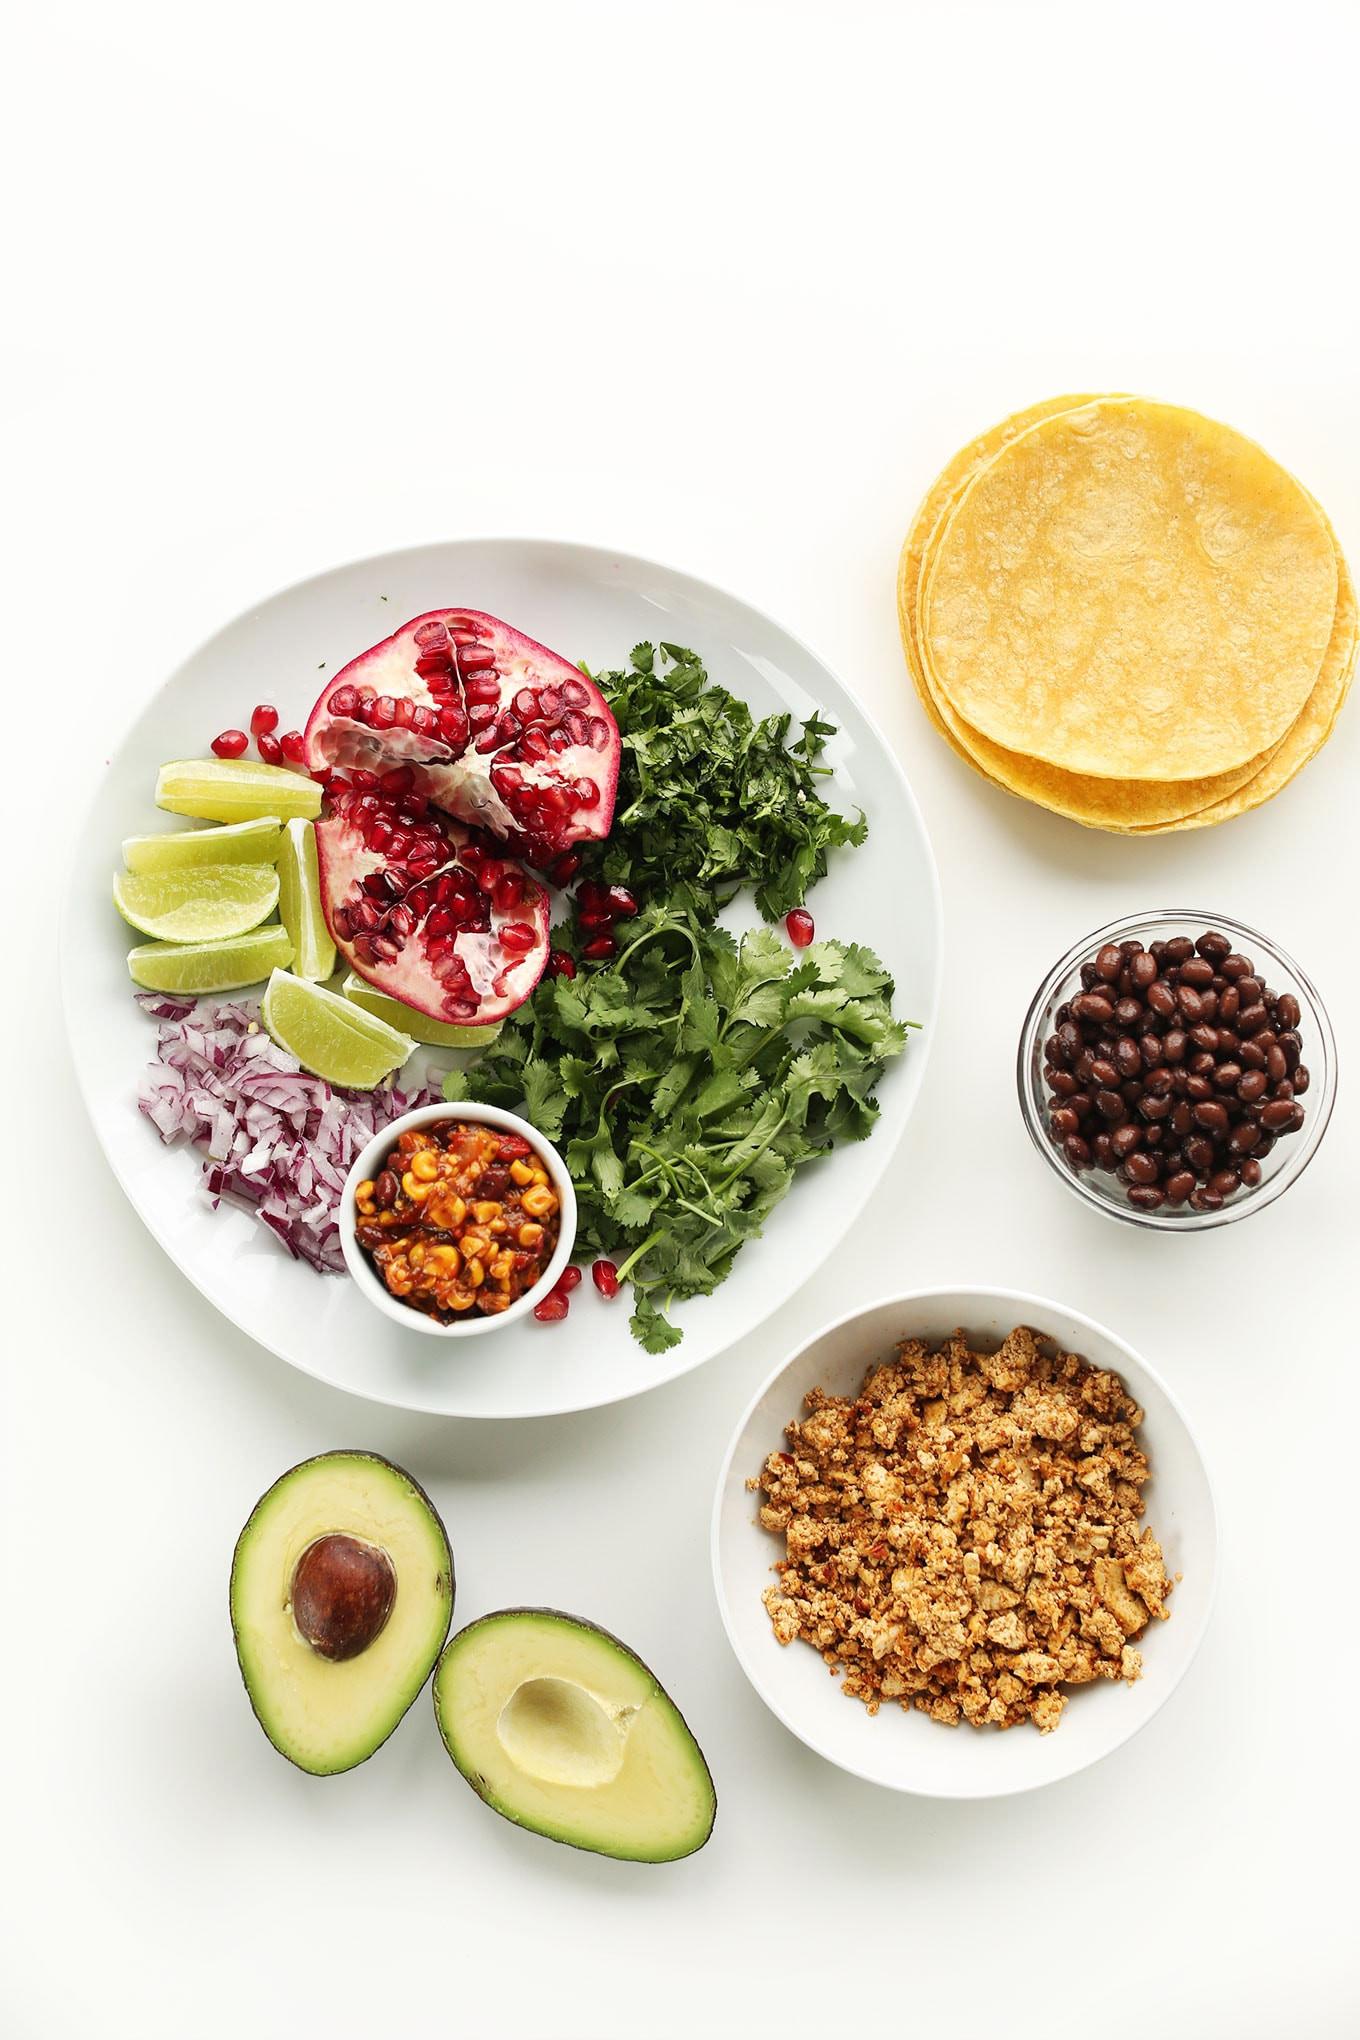 Easy Vegan Breakfast  Meal Prep Recipes Breakfast Fit Foo Finds